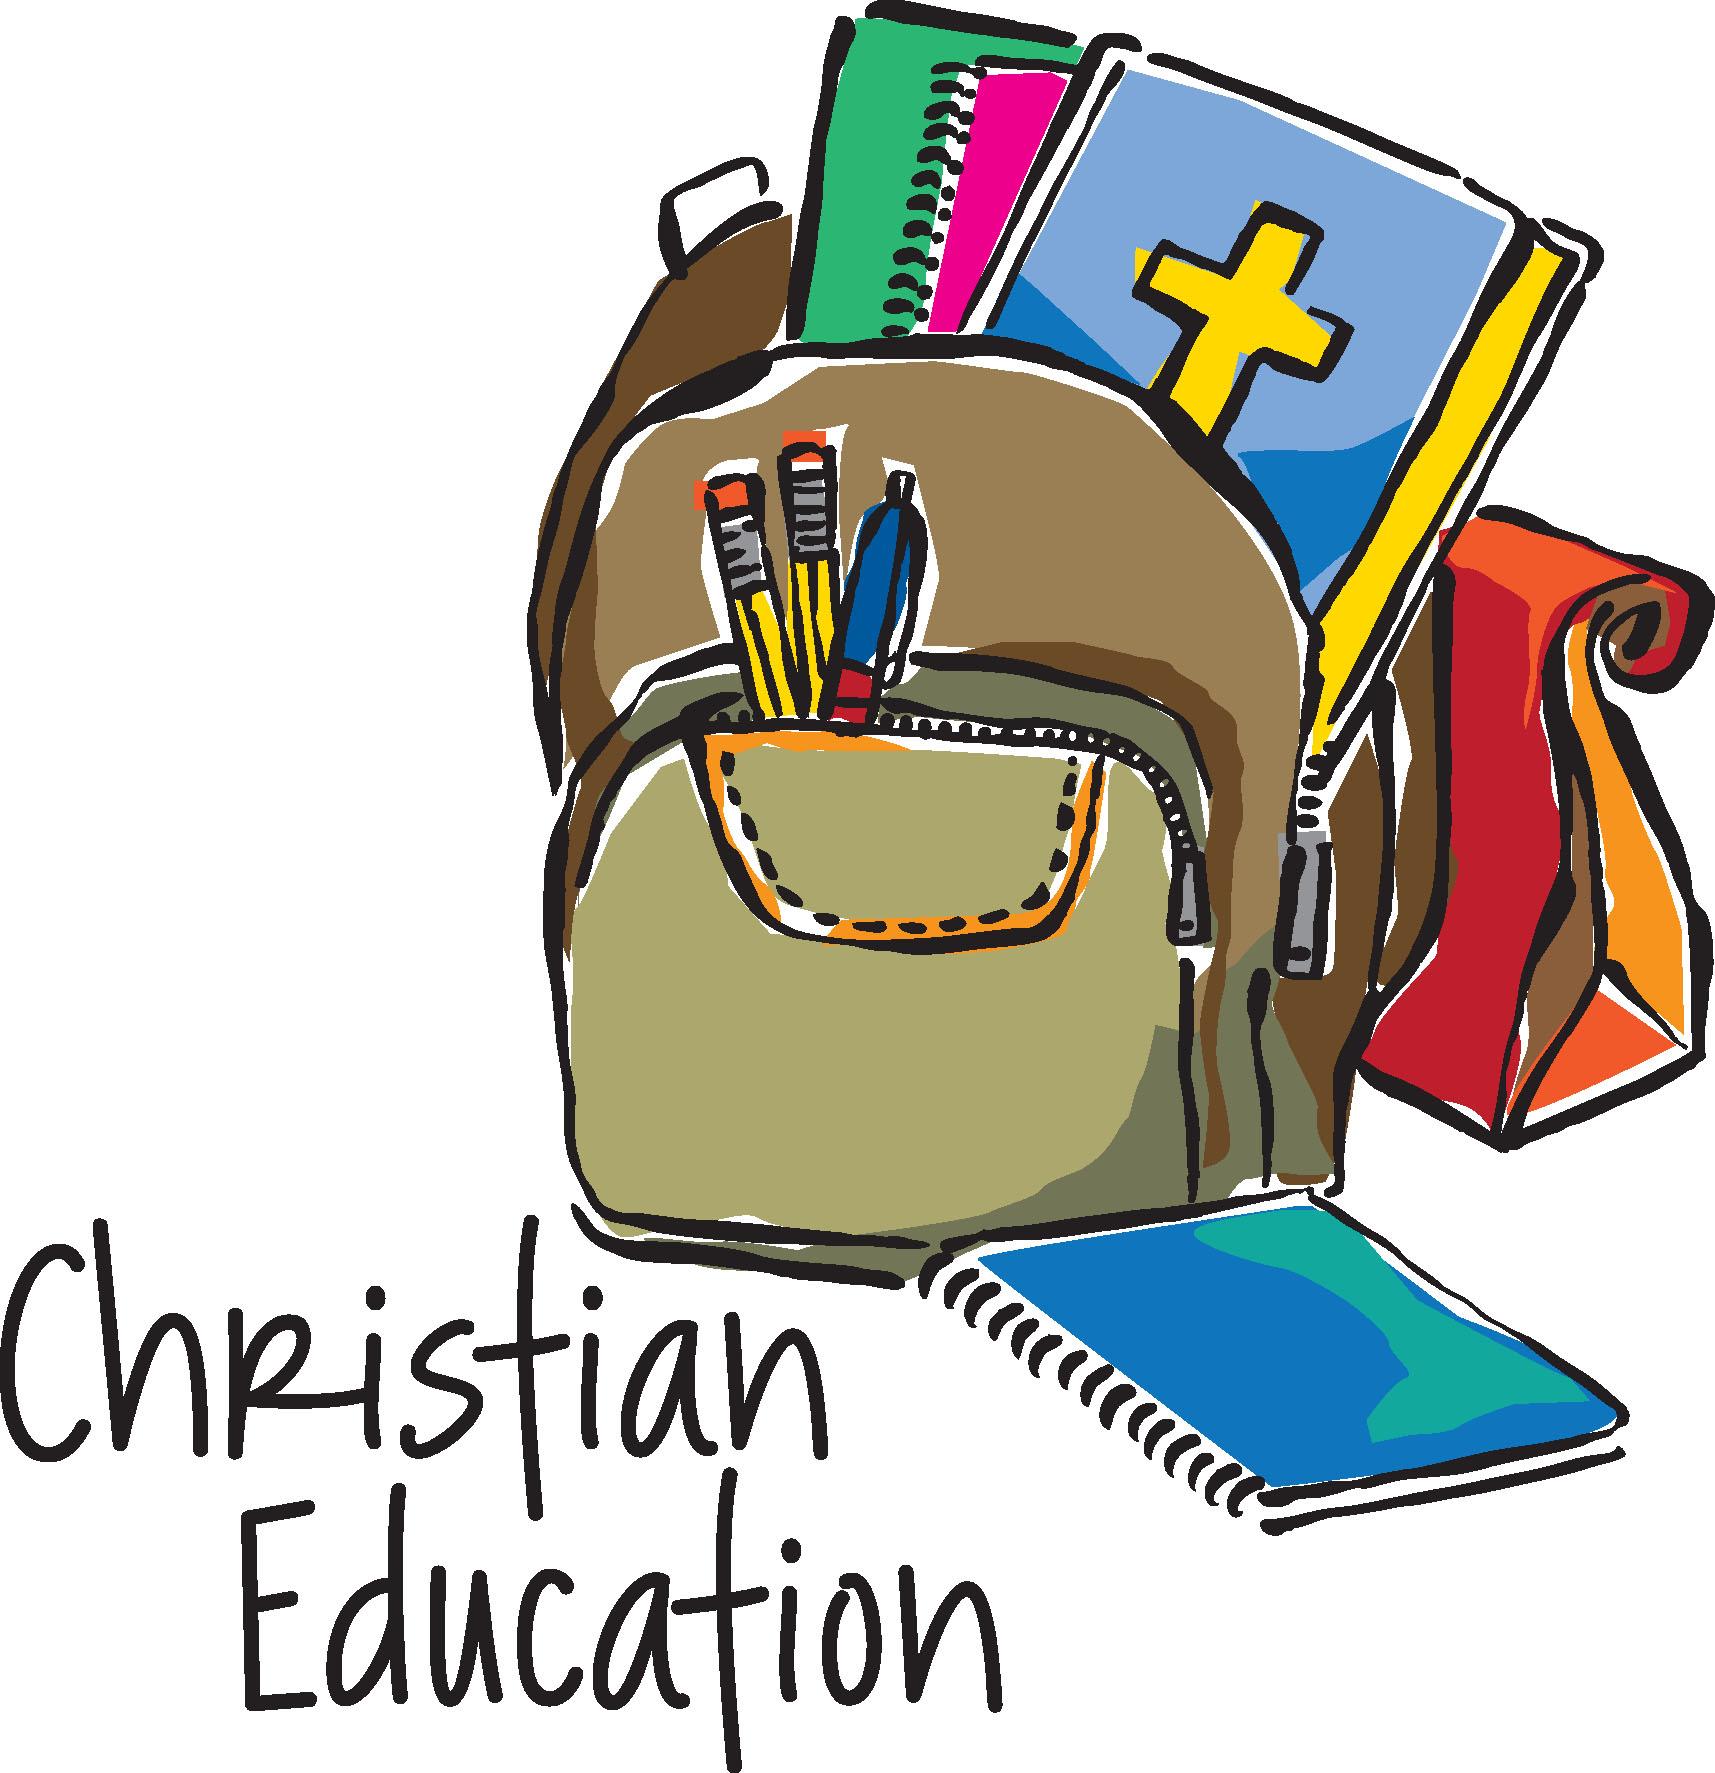 Religious clipart religious education Art image Religious education education